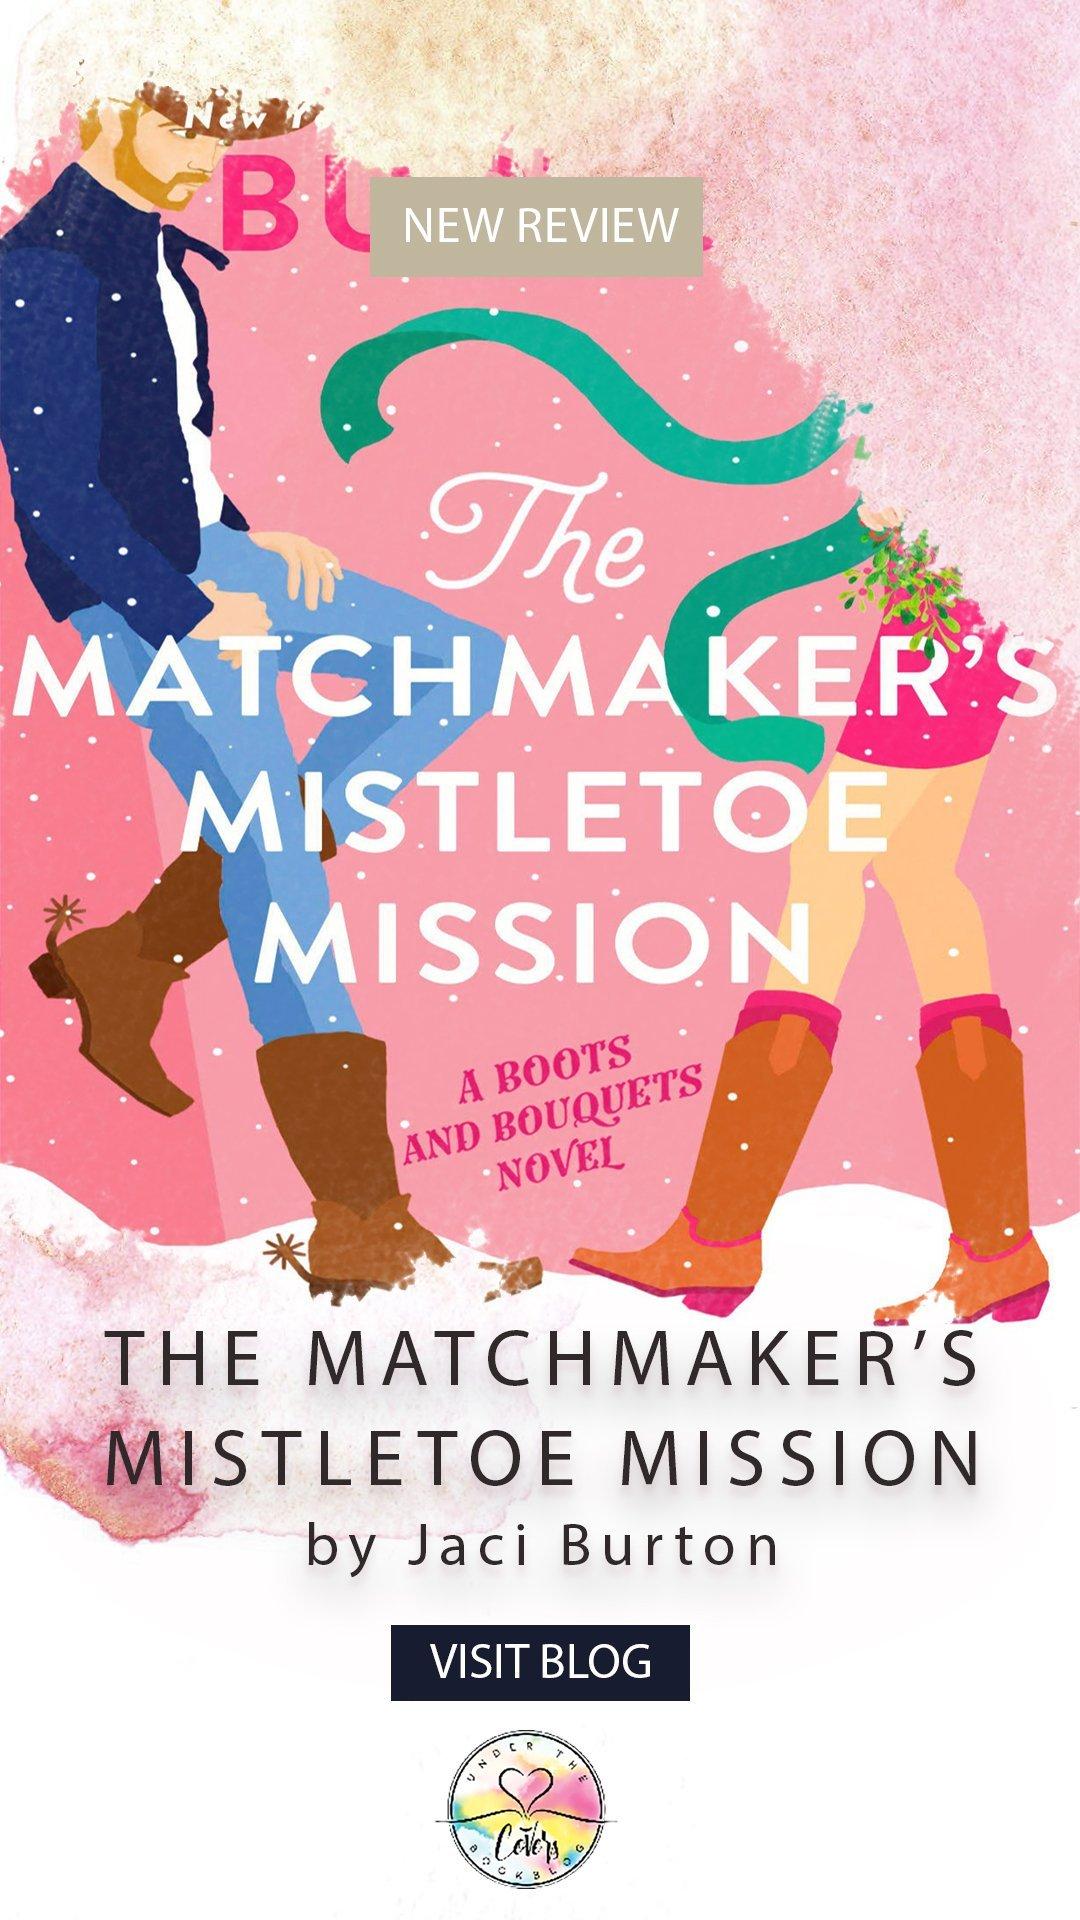 ARC Review: The Matchmaker's Mistletoe Mission by Jaci Burton